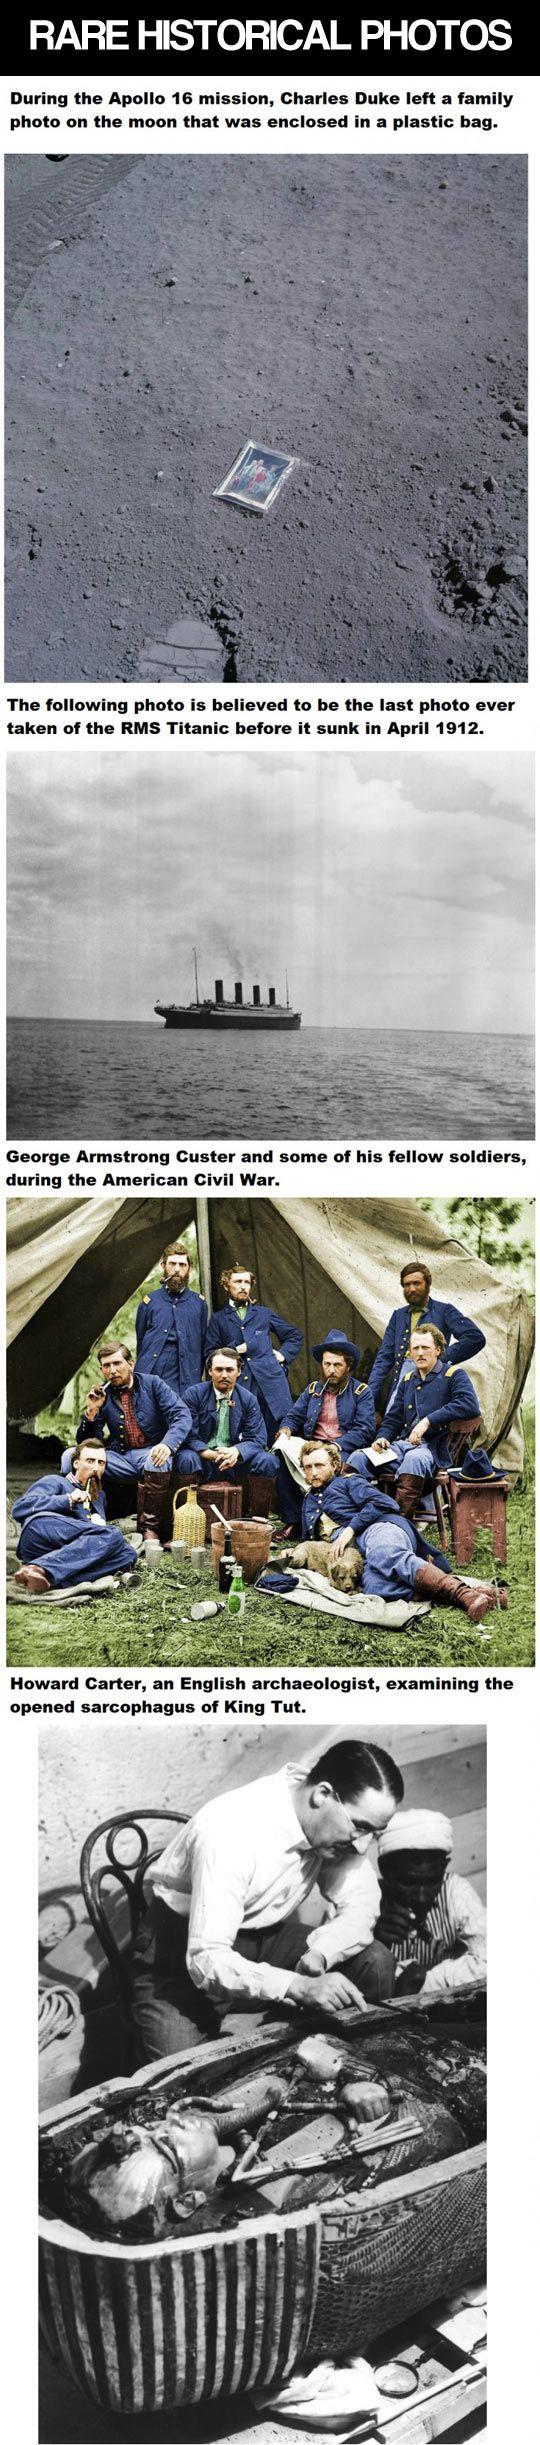 Rare historical photographs.